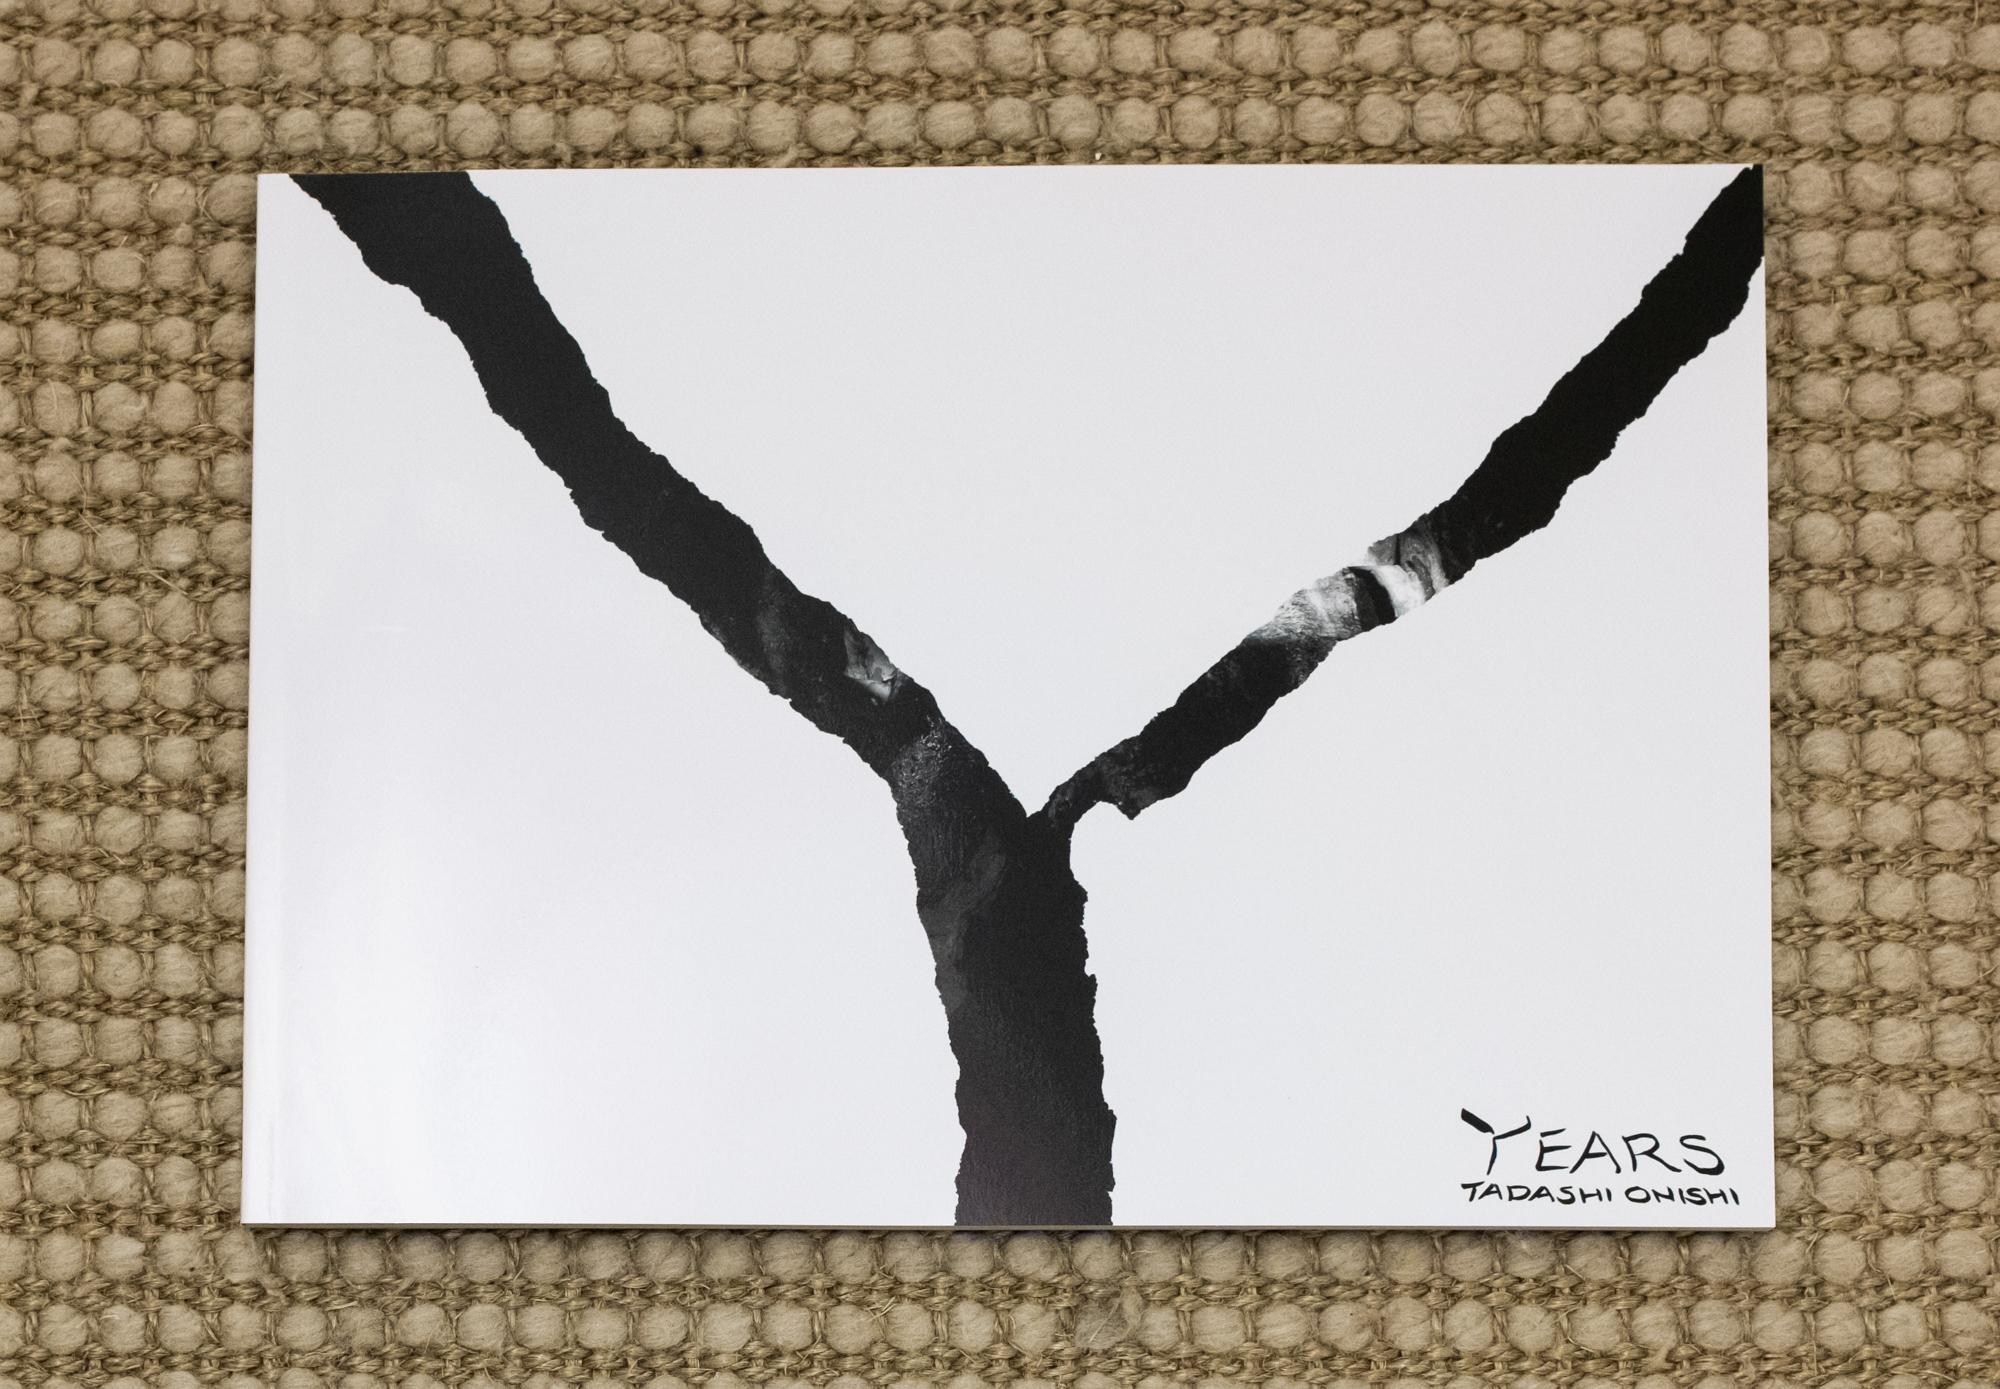 YEARS - 2 (February)